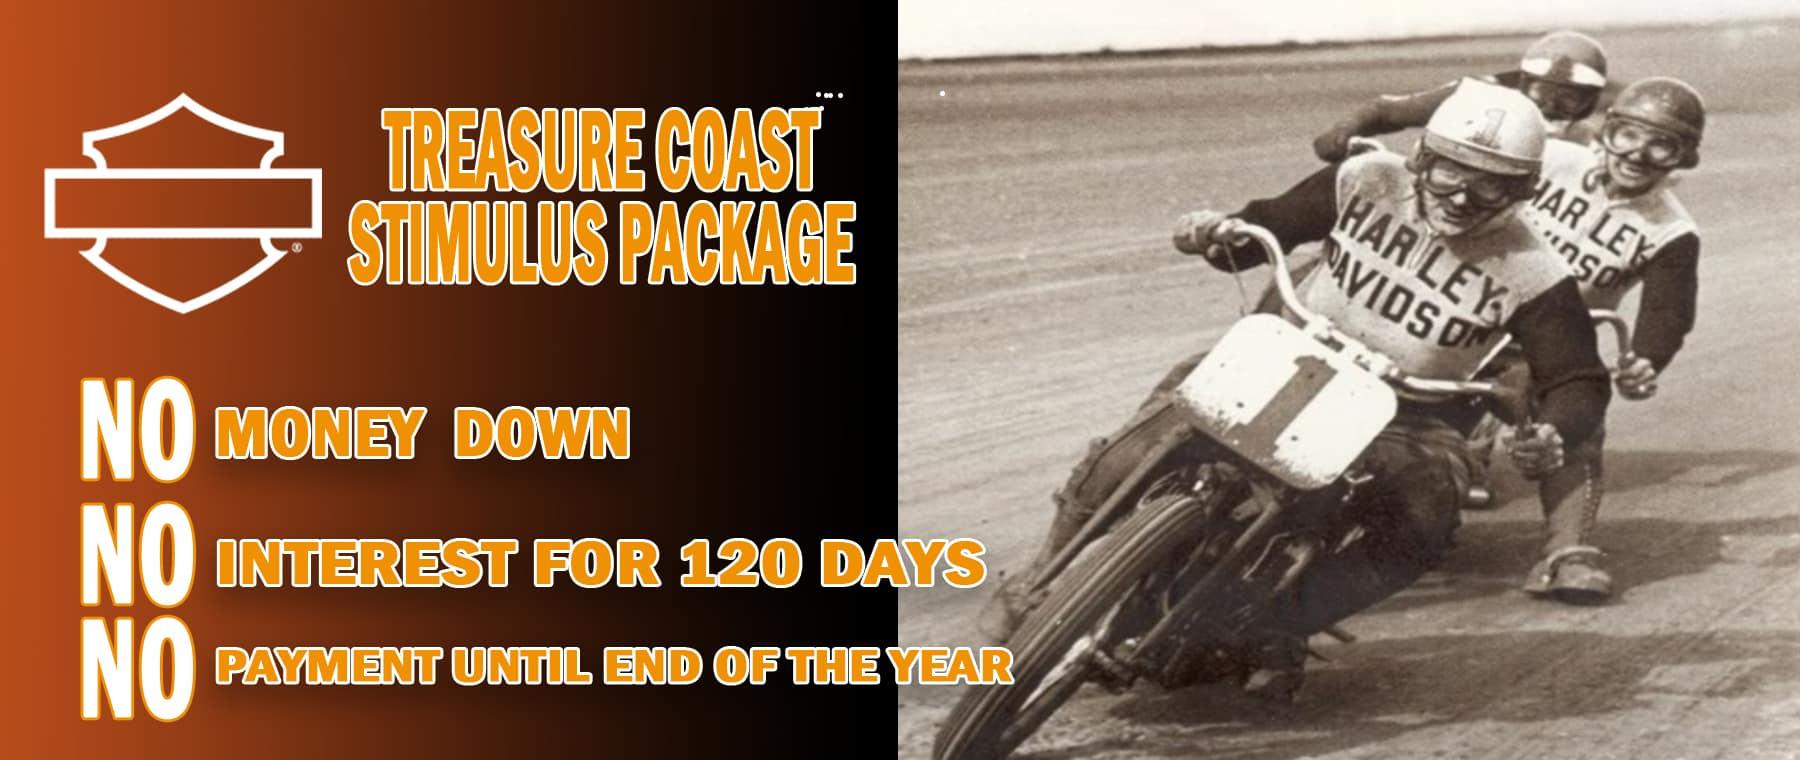 Treasure Coast Harley-Davidson Stimulus Package in Stuart FL